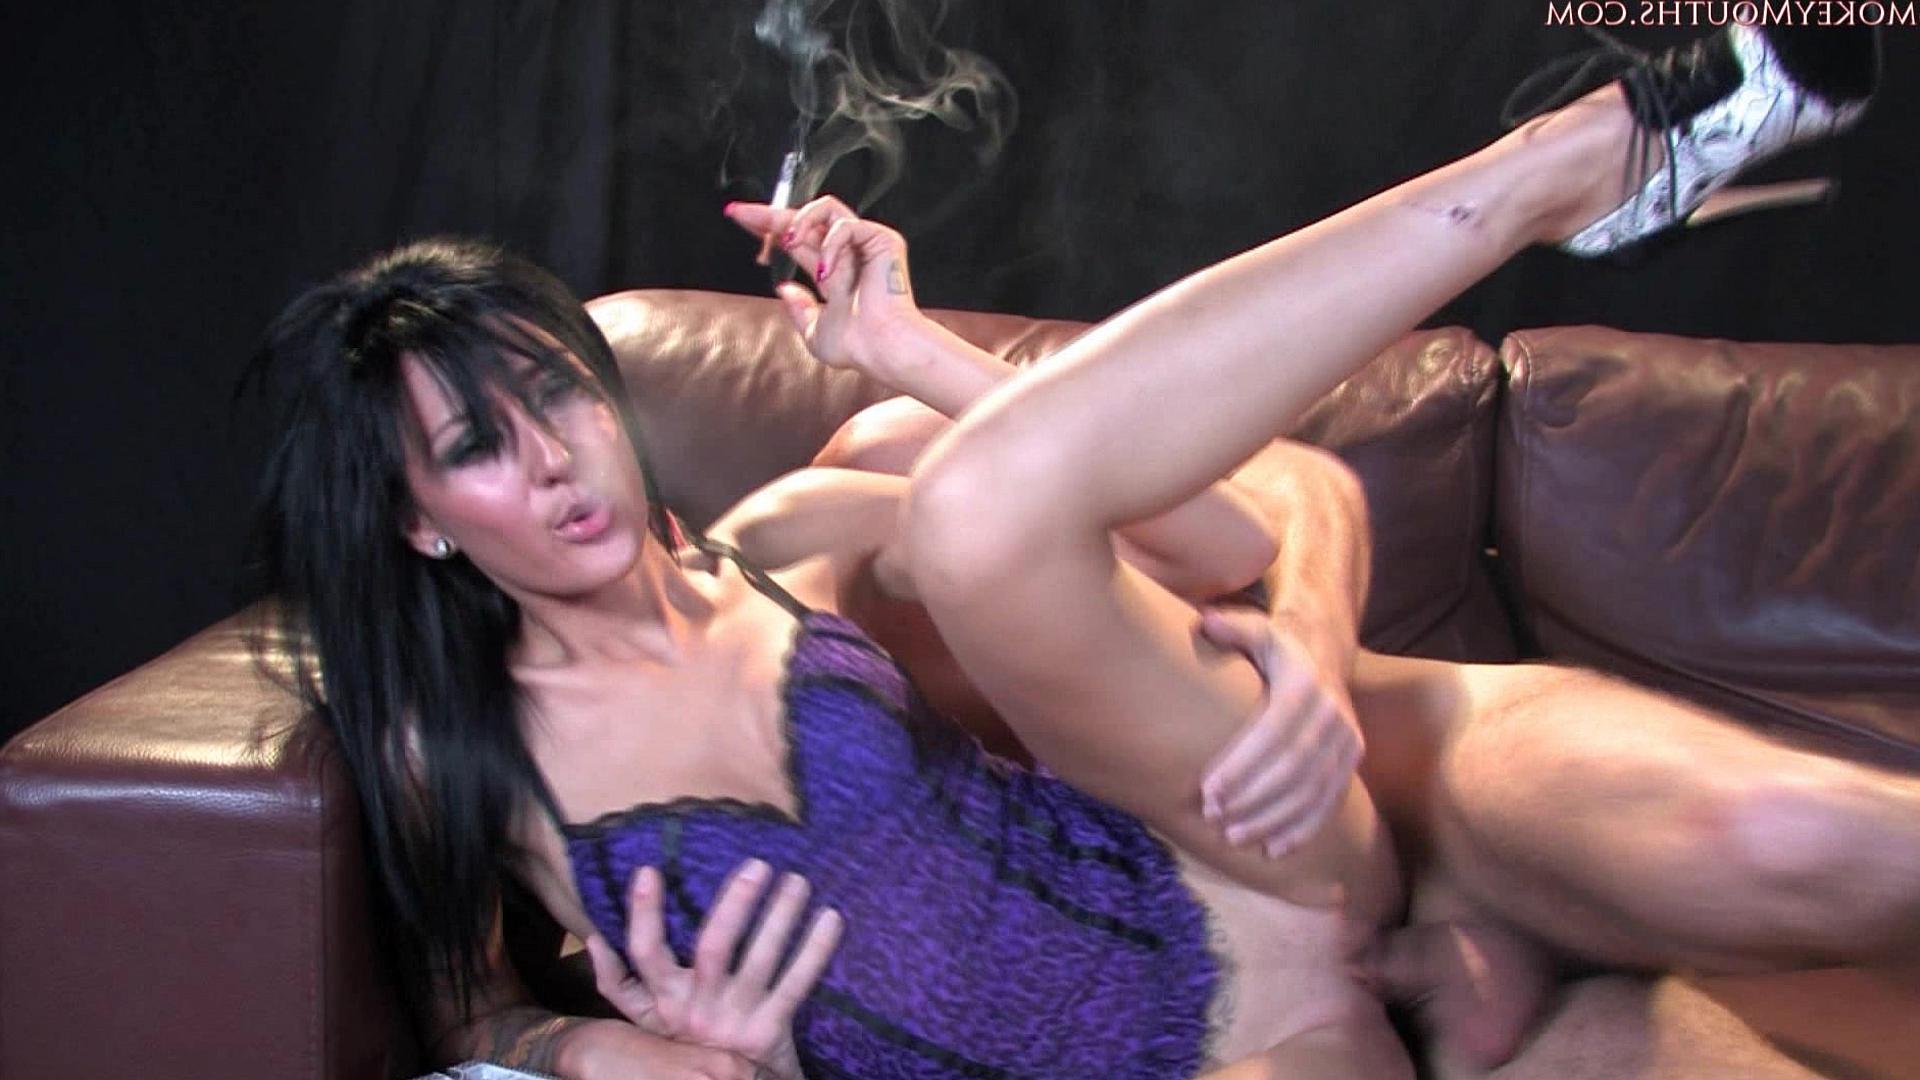 Порно фото с сигаретой